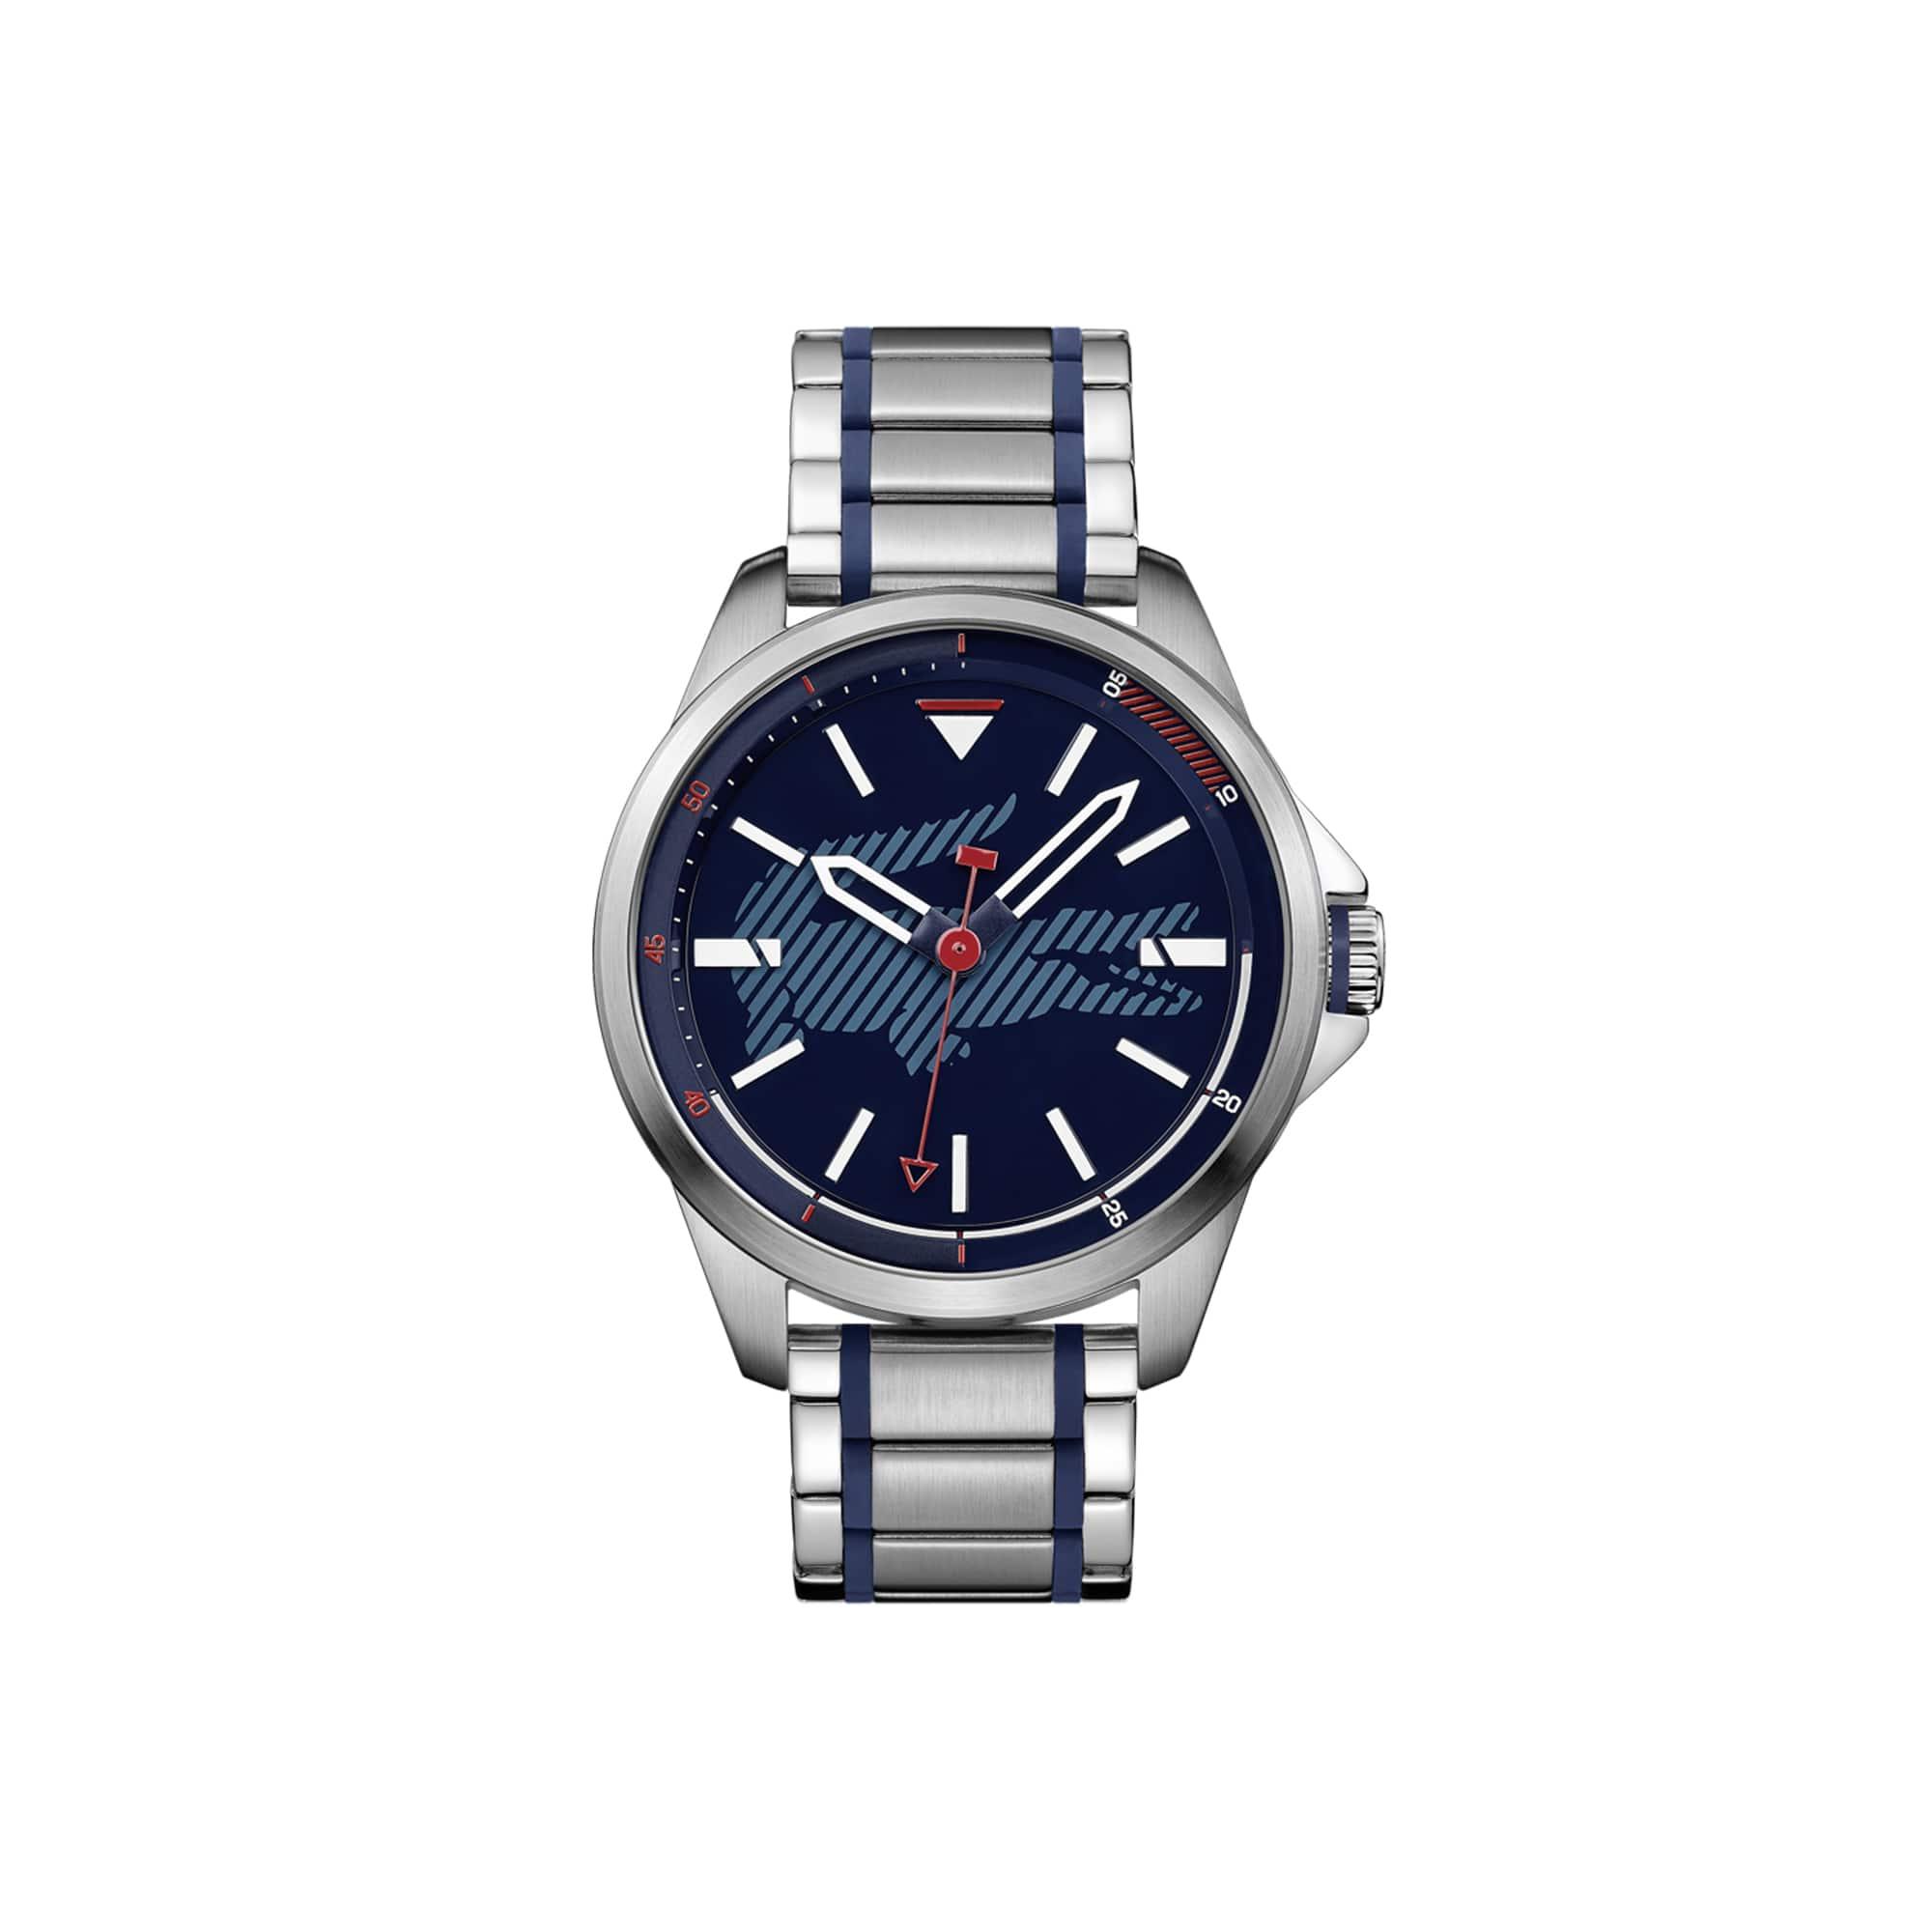 CAPBRETON Herrenuhr mit Edelstahl-Armband und blaue Silikonnähten